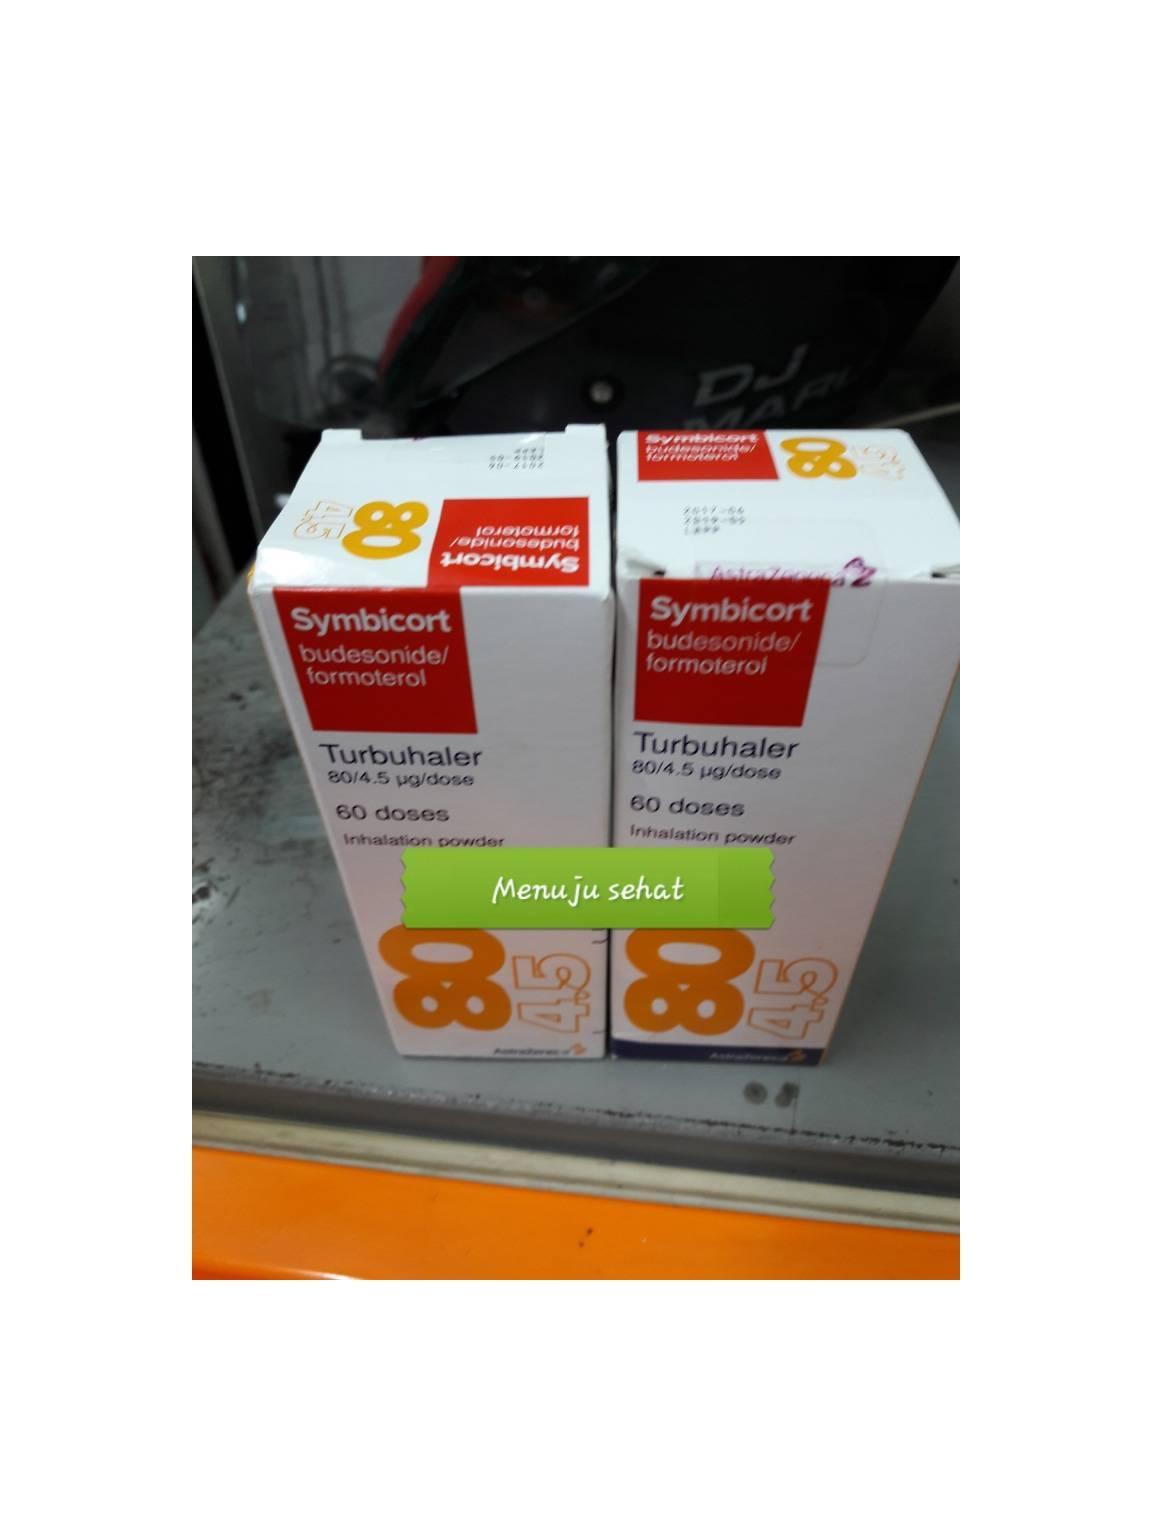 symbicort turbuhaler 120 doses asma inhaler page 2 daftar update